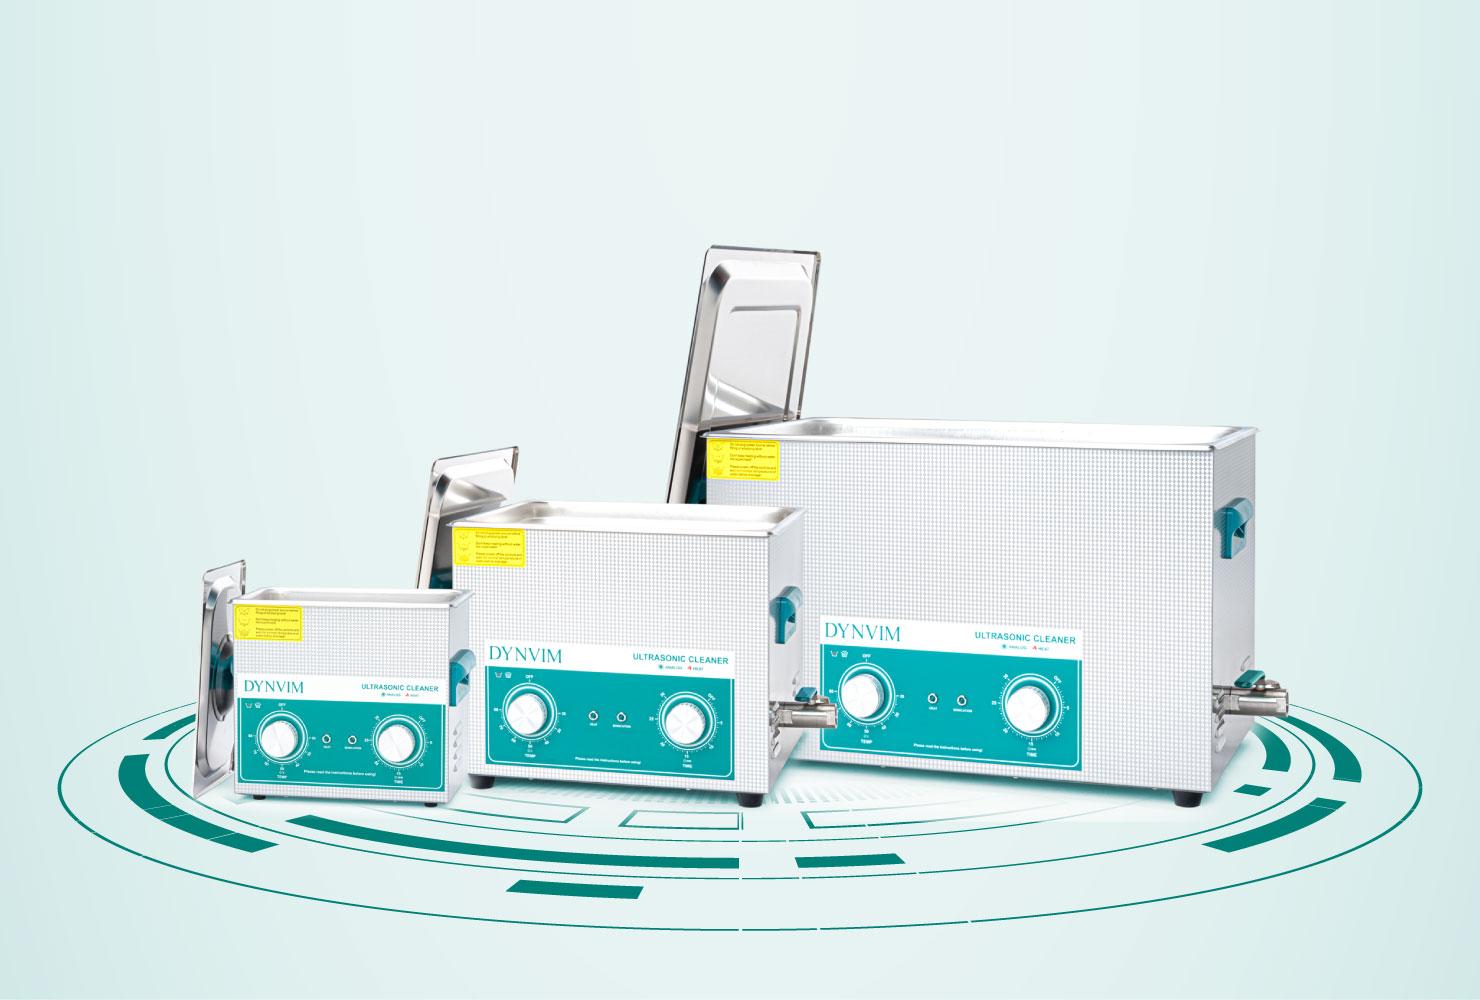 Analog Ultrasound Machines